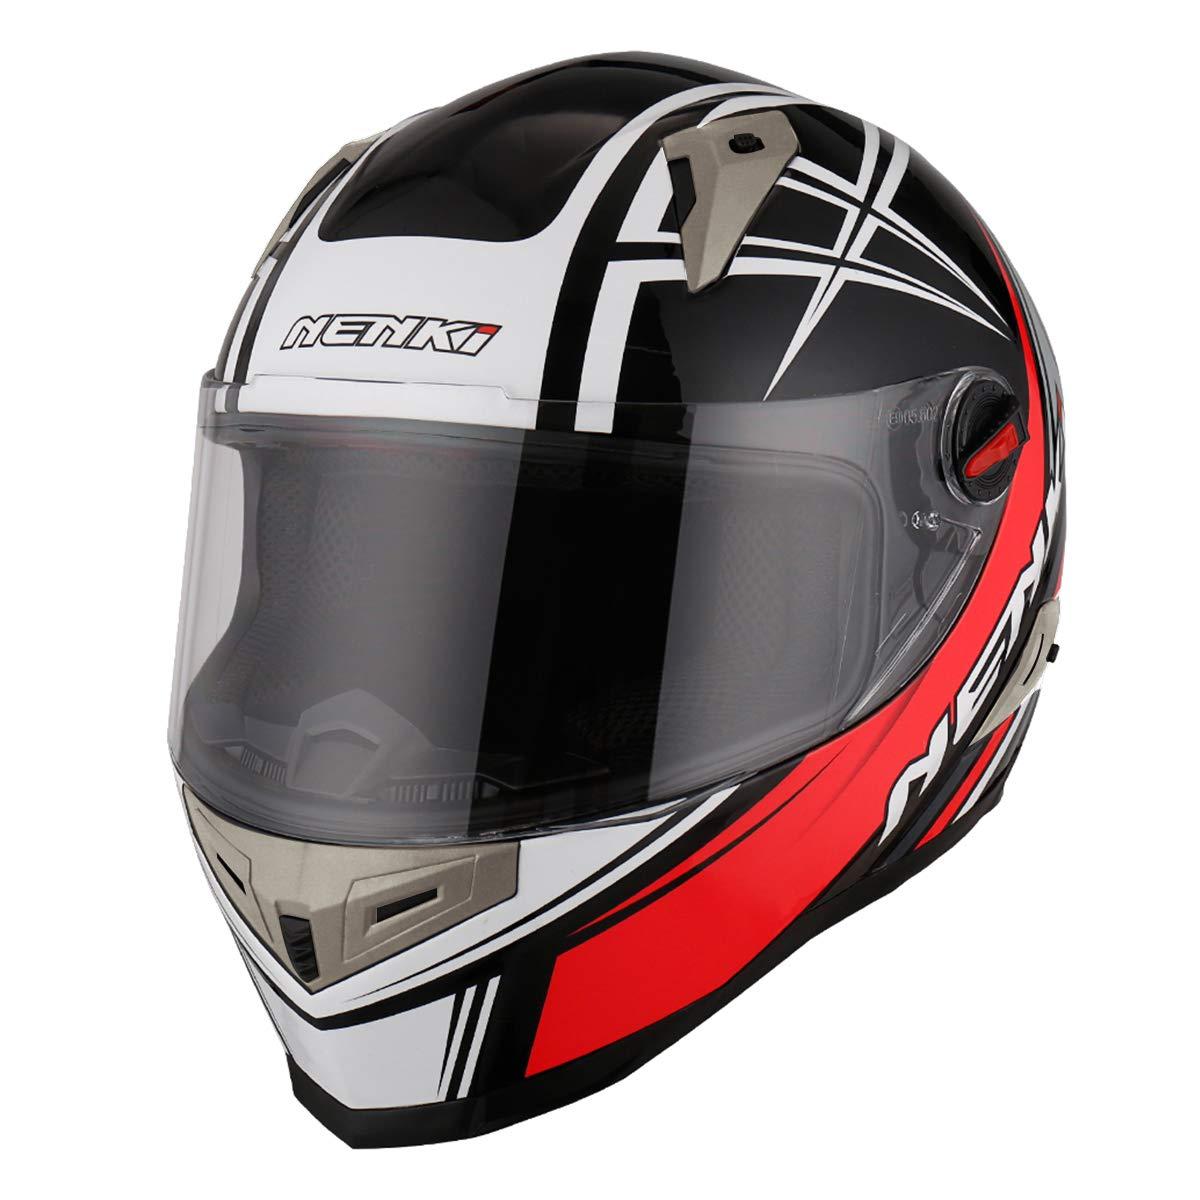 NENKI Full Face Motorcycle Motorbike Helmet NK-863,ECE Approved Medium, Black Green Grey